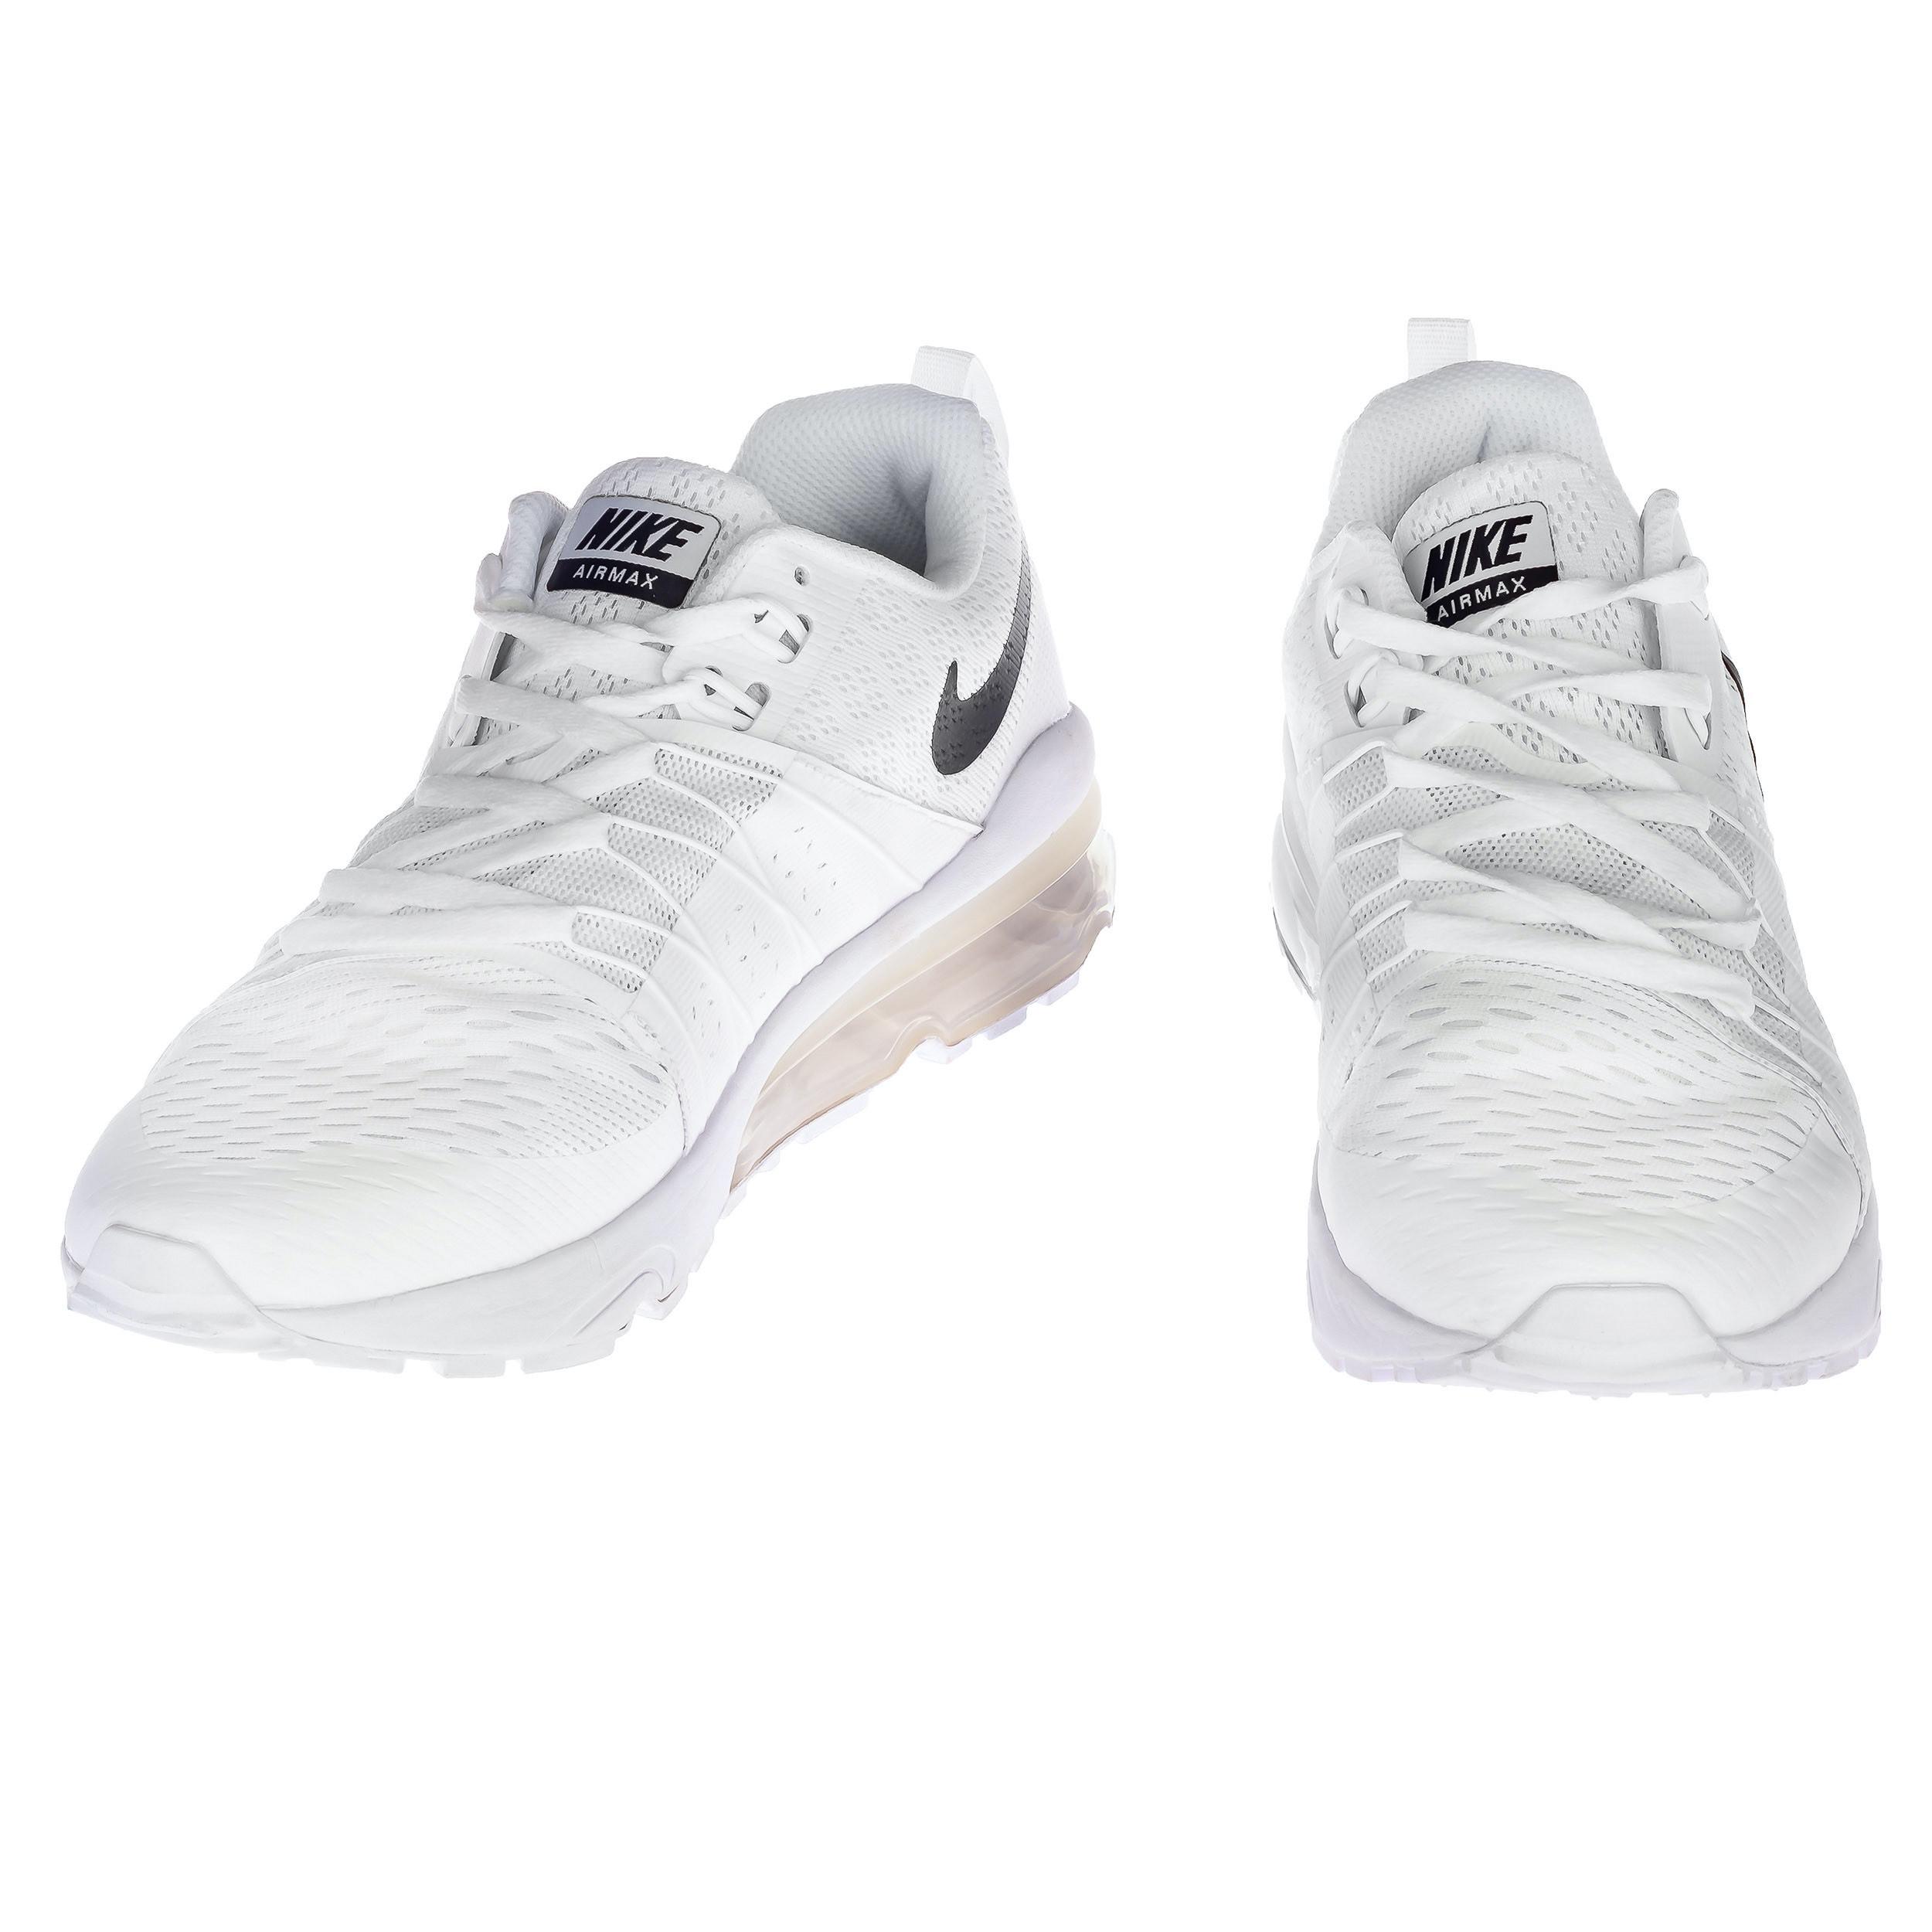 خرید                      کفش  پیاده روی مردانه کد A29